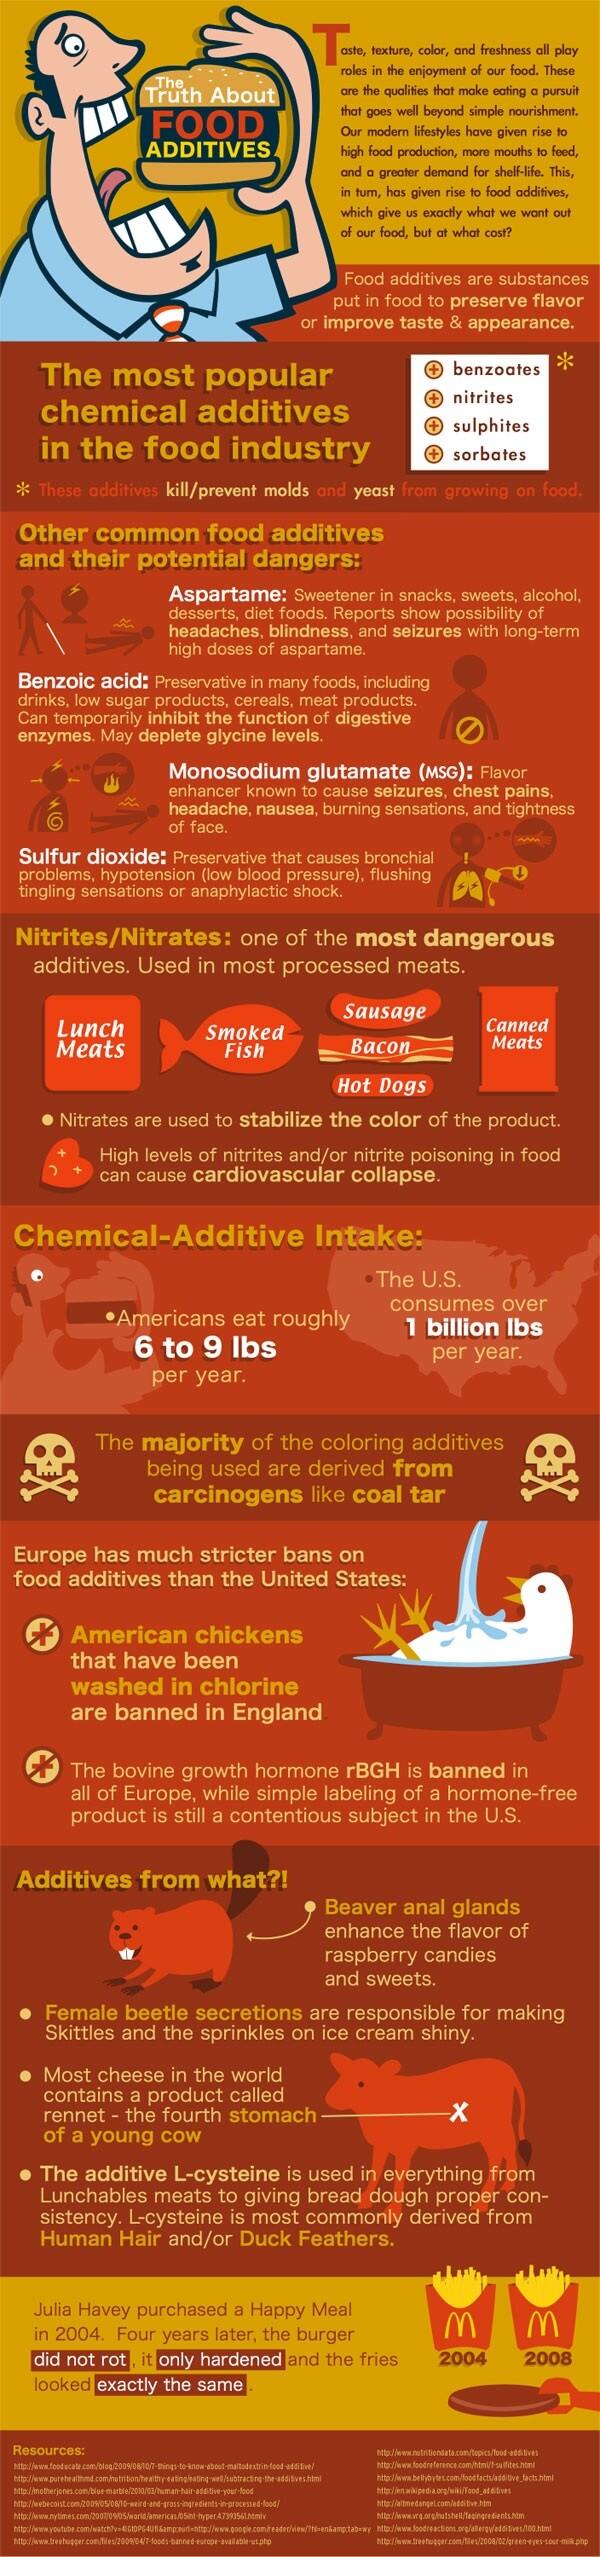 understanding-food-additives